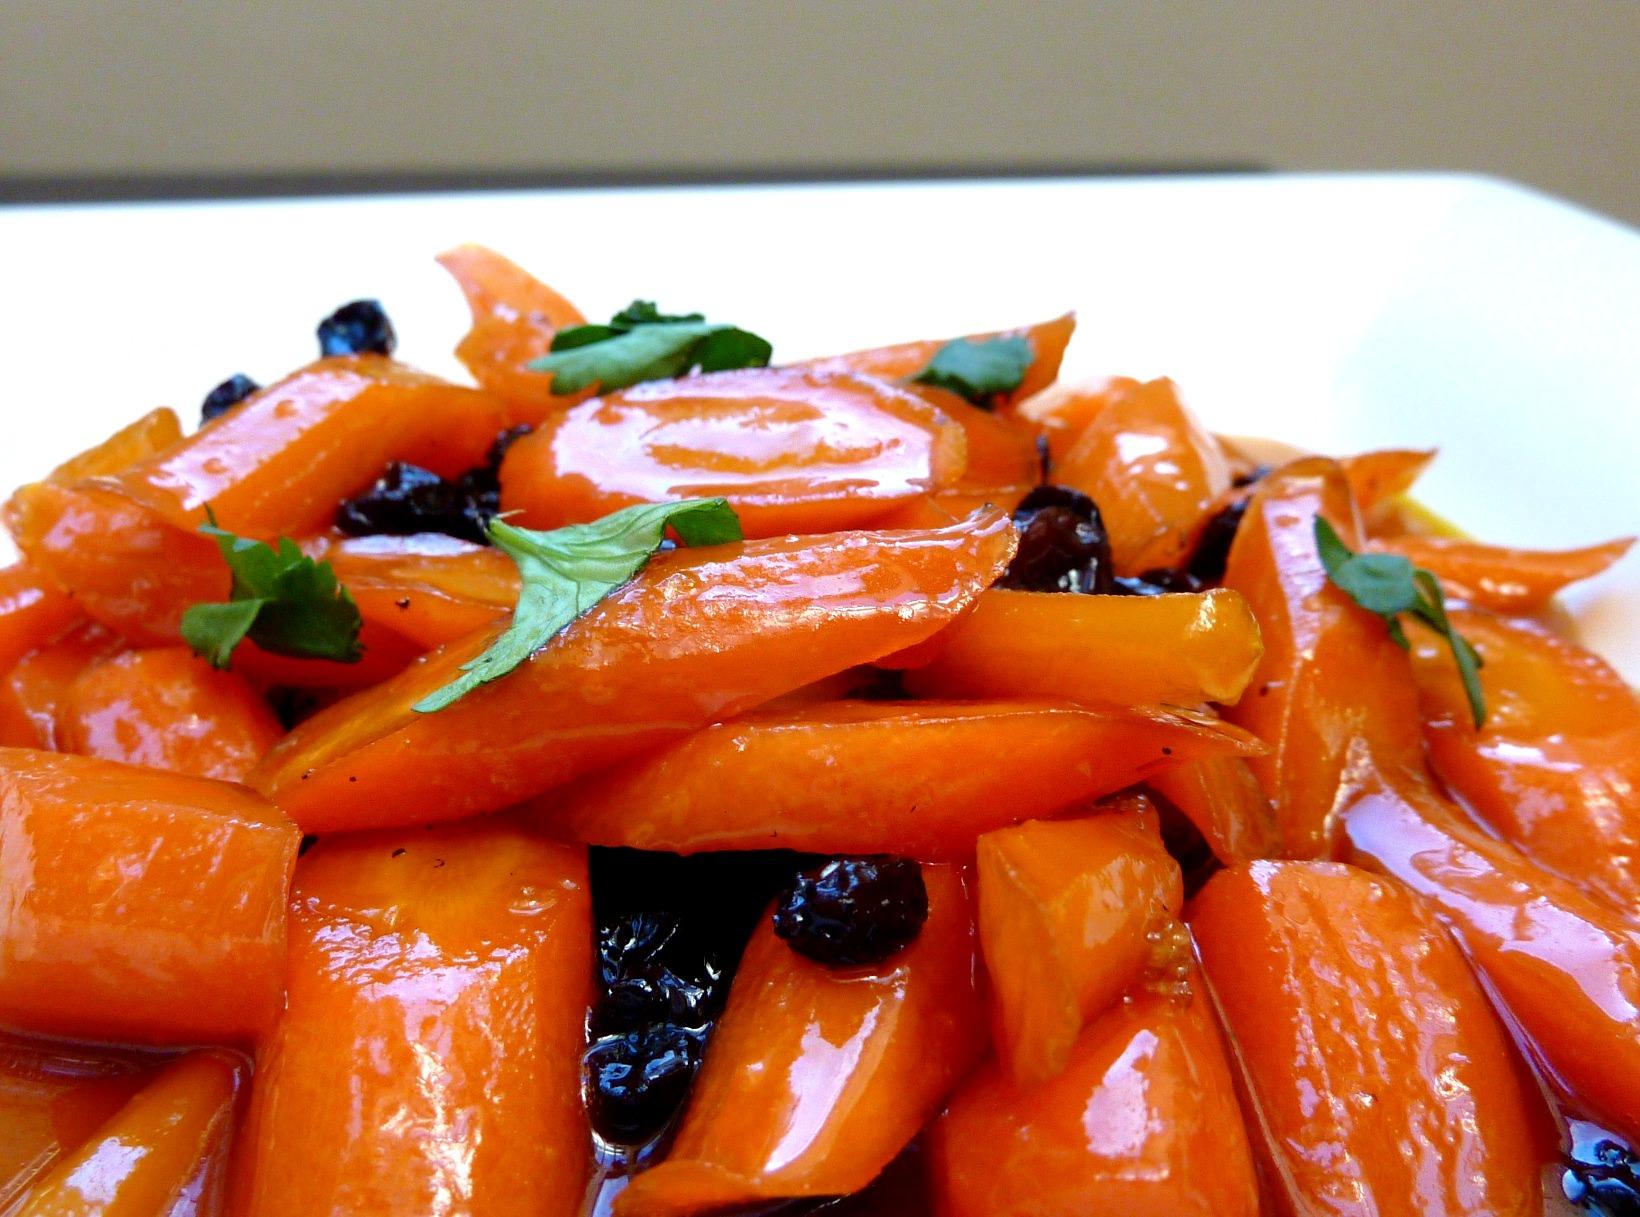 Honey Tangerine Glazed Carrots with Currants